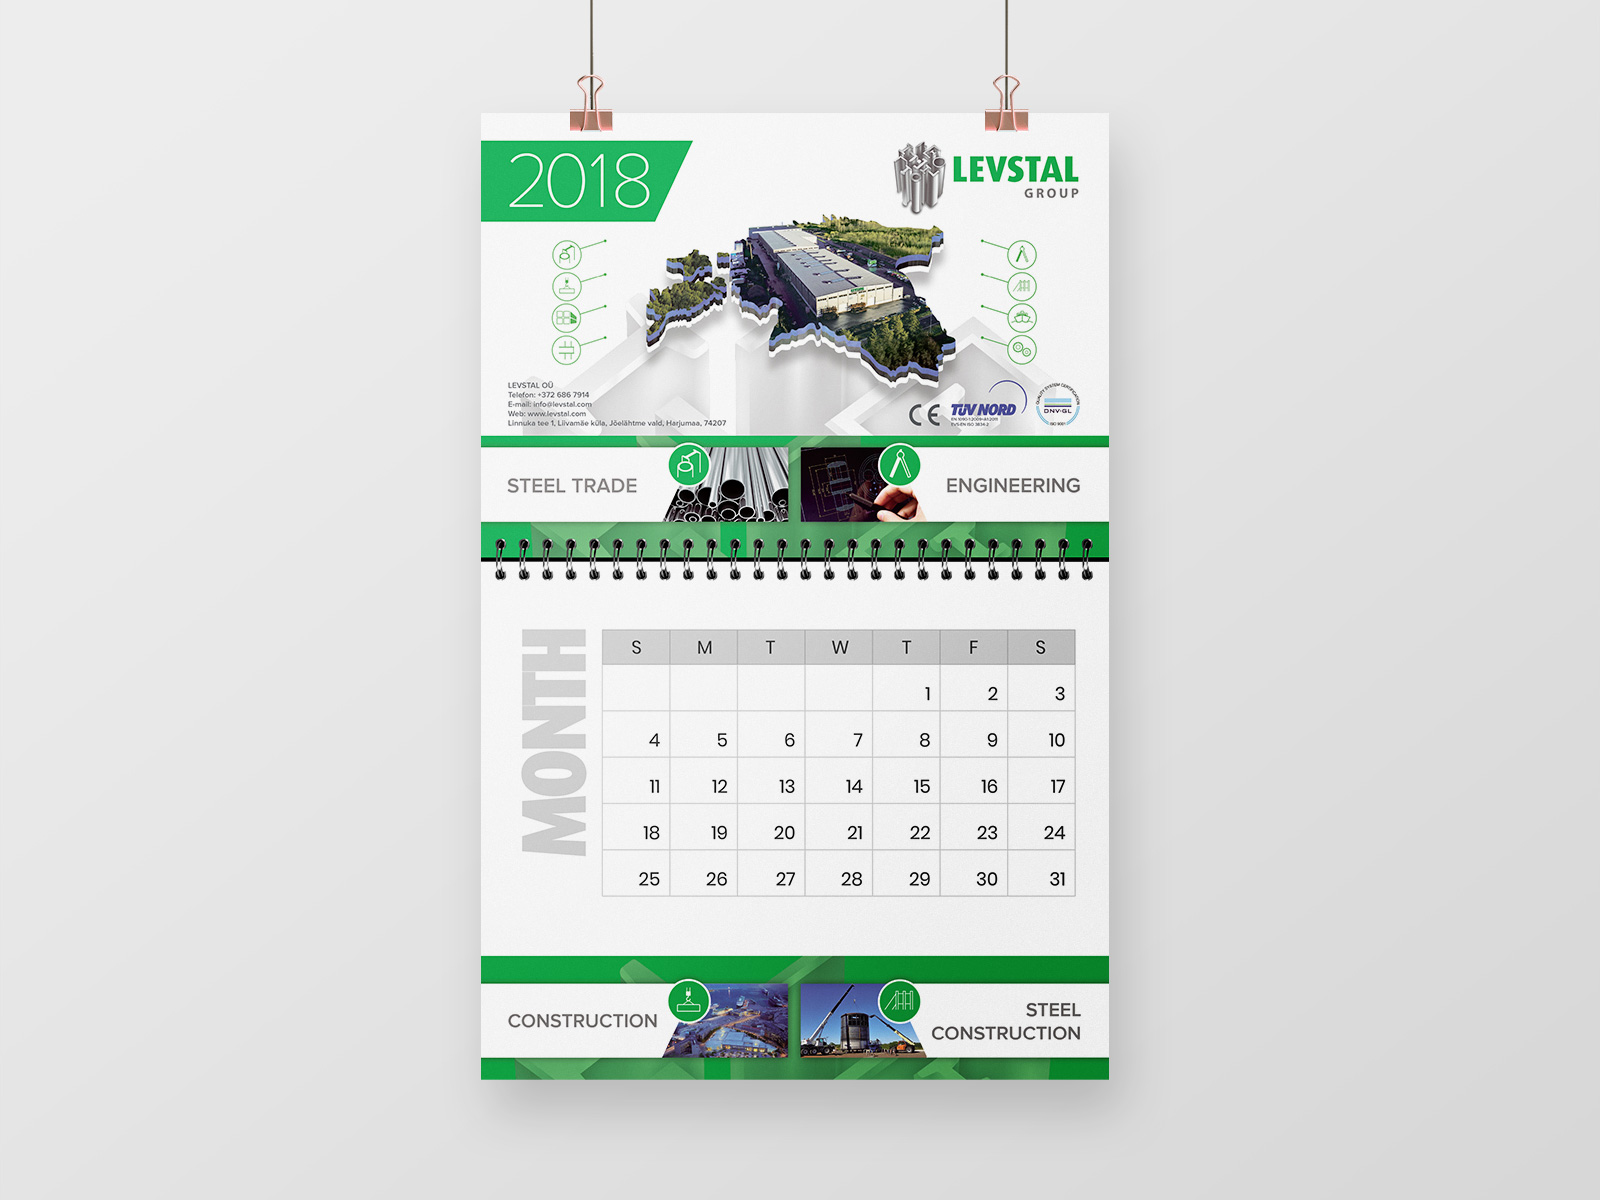 levstal calendar